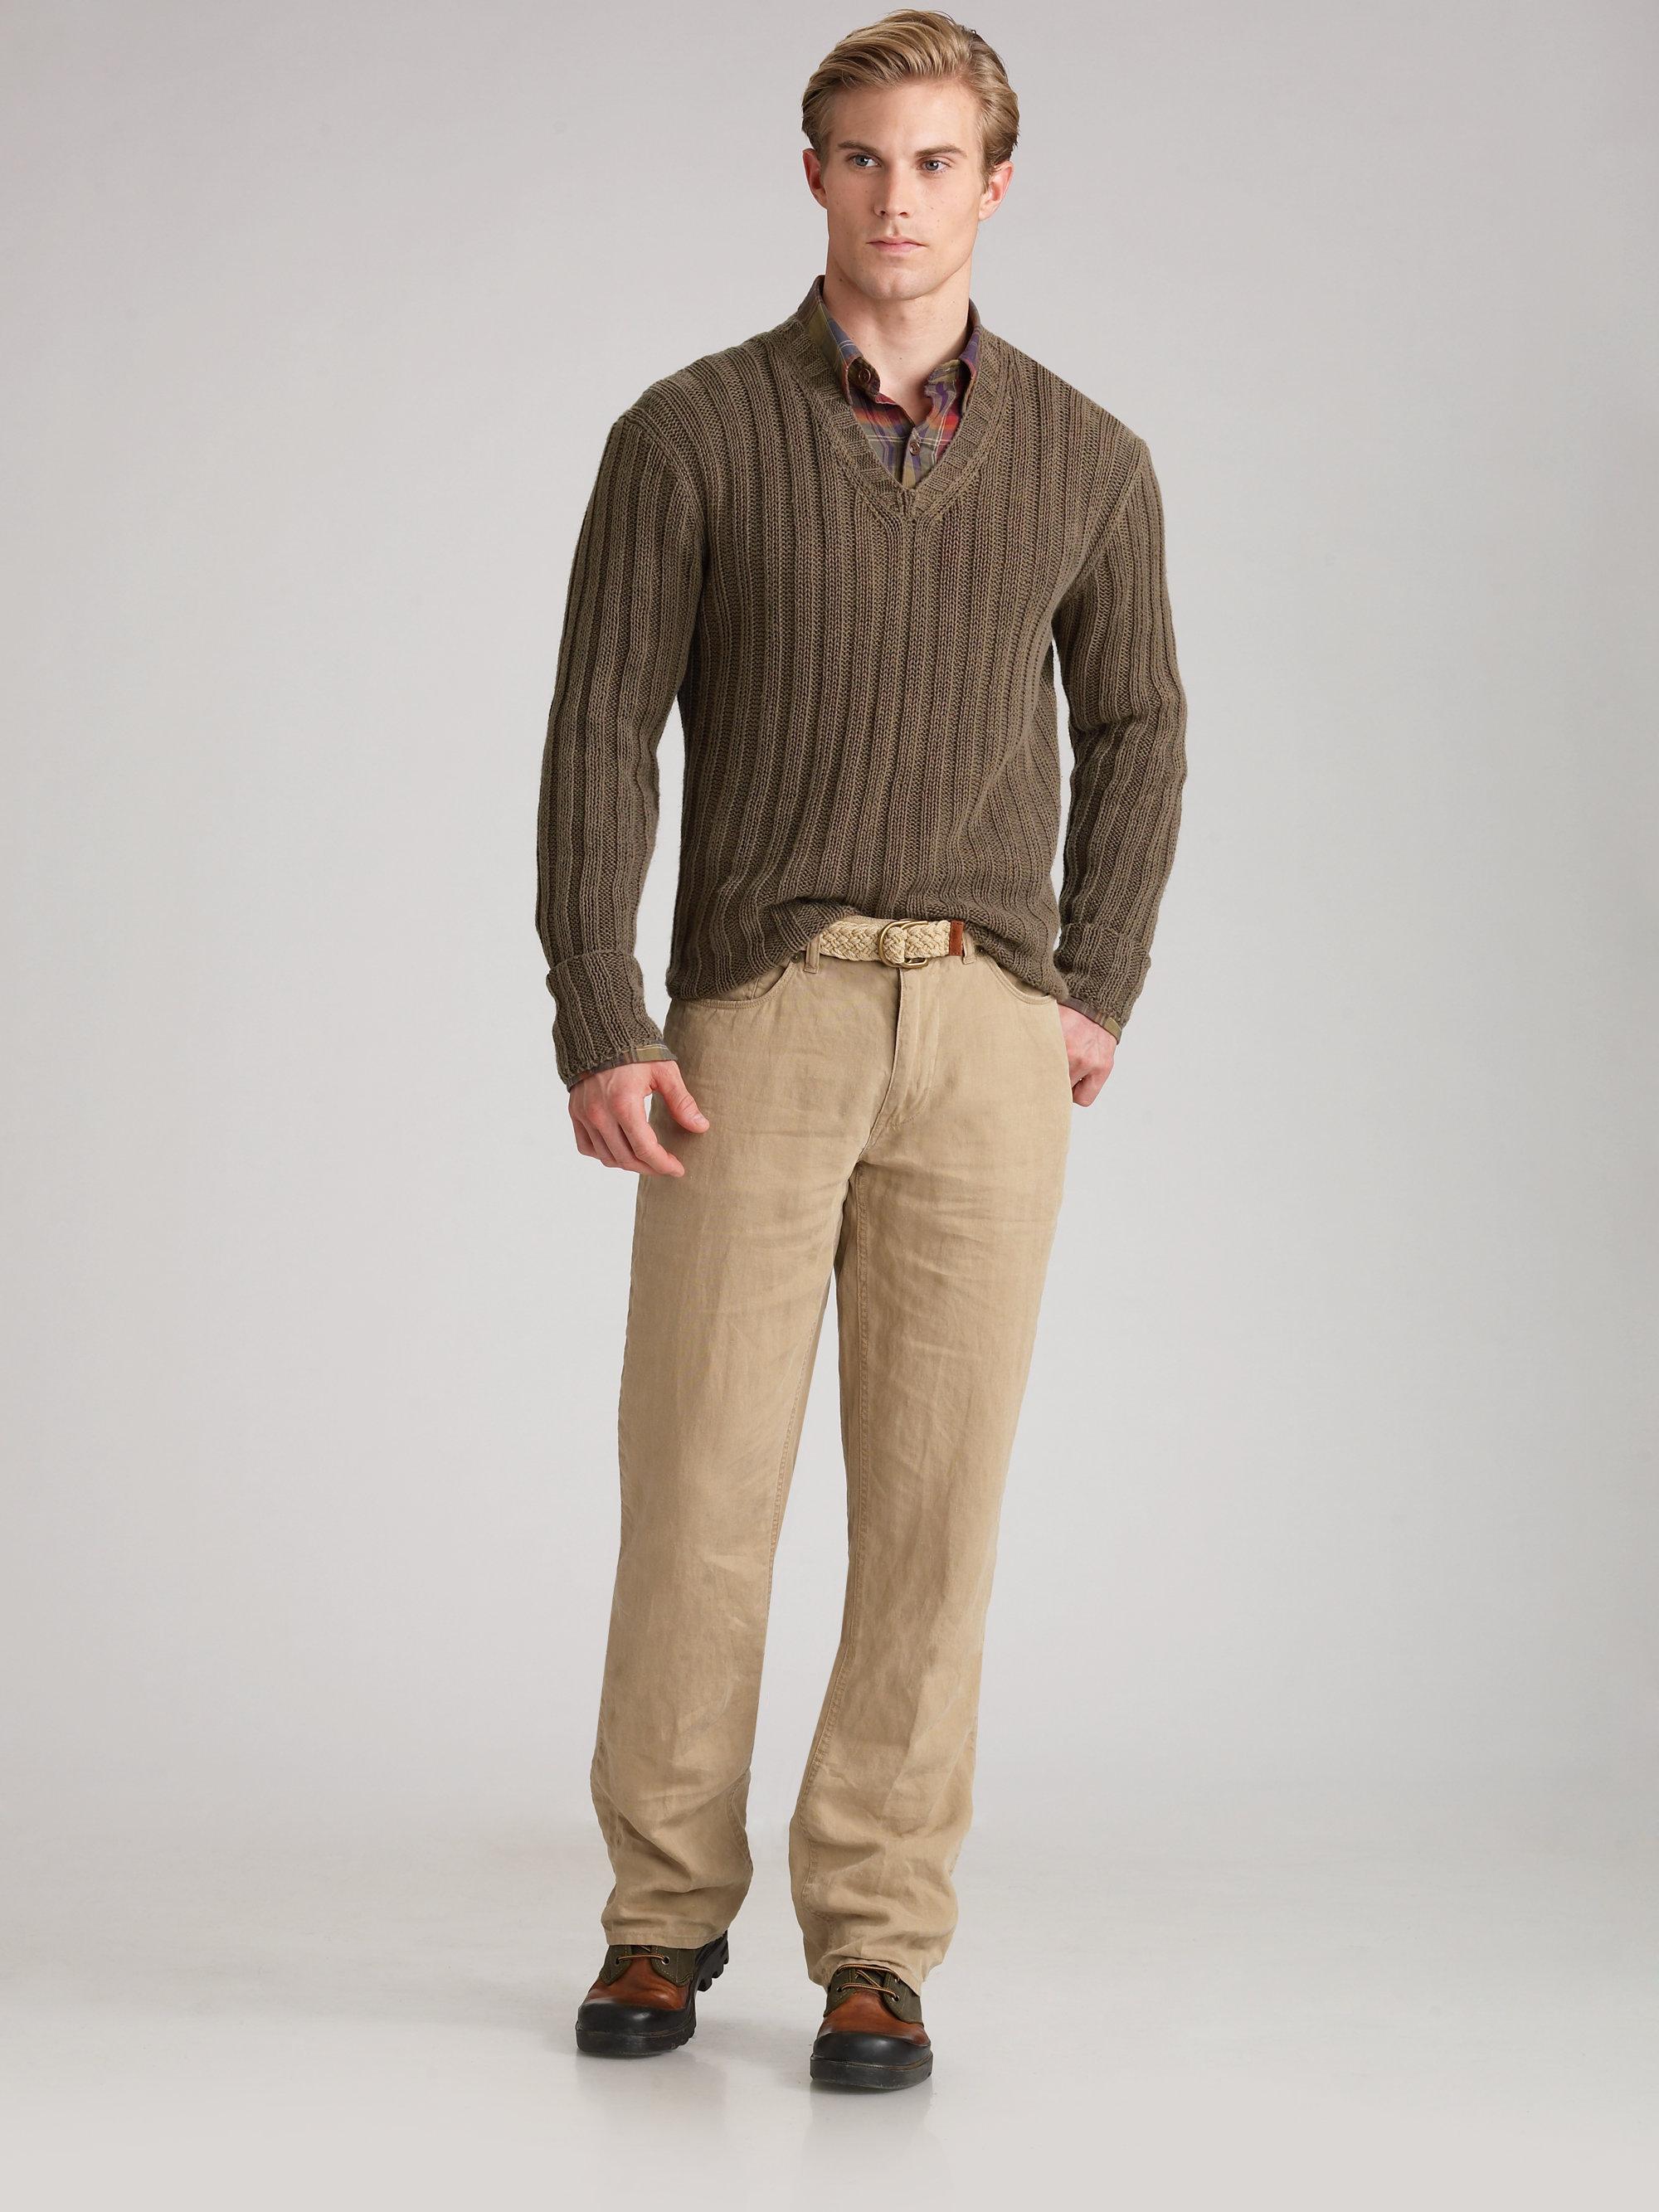 Polo ralph lauren Linen Pants in Natural for Men   Lyst